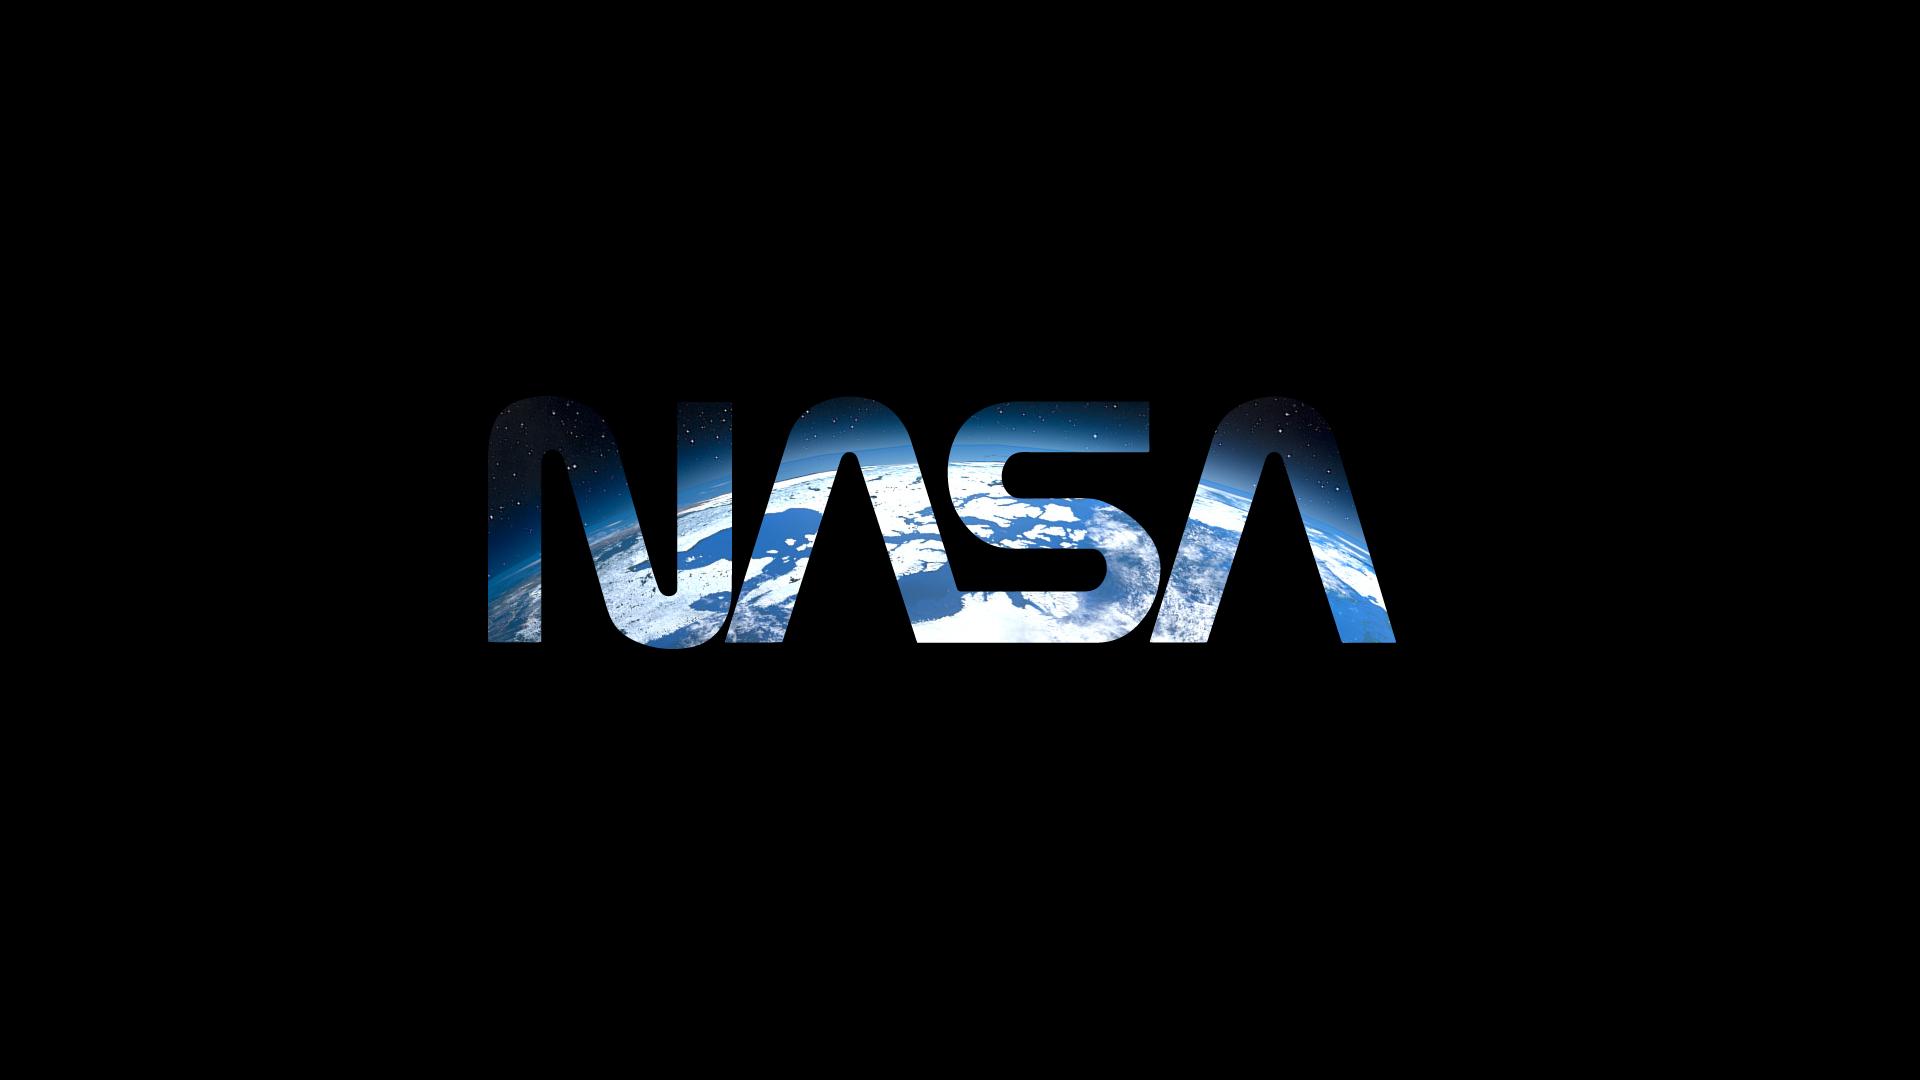 NASA BLACK WALLPAPER HD